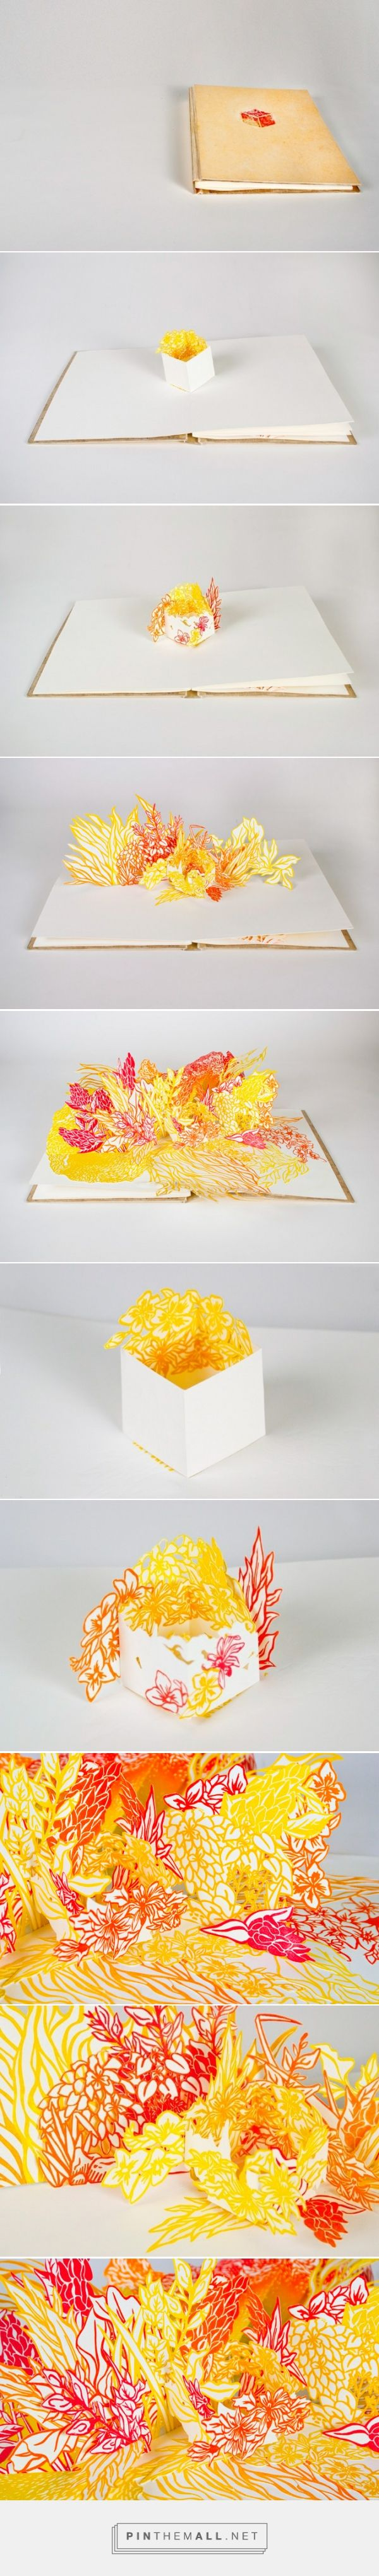 Cube Pop-Up Book on Behance